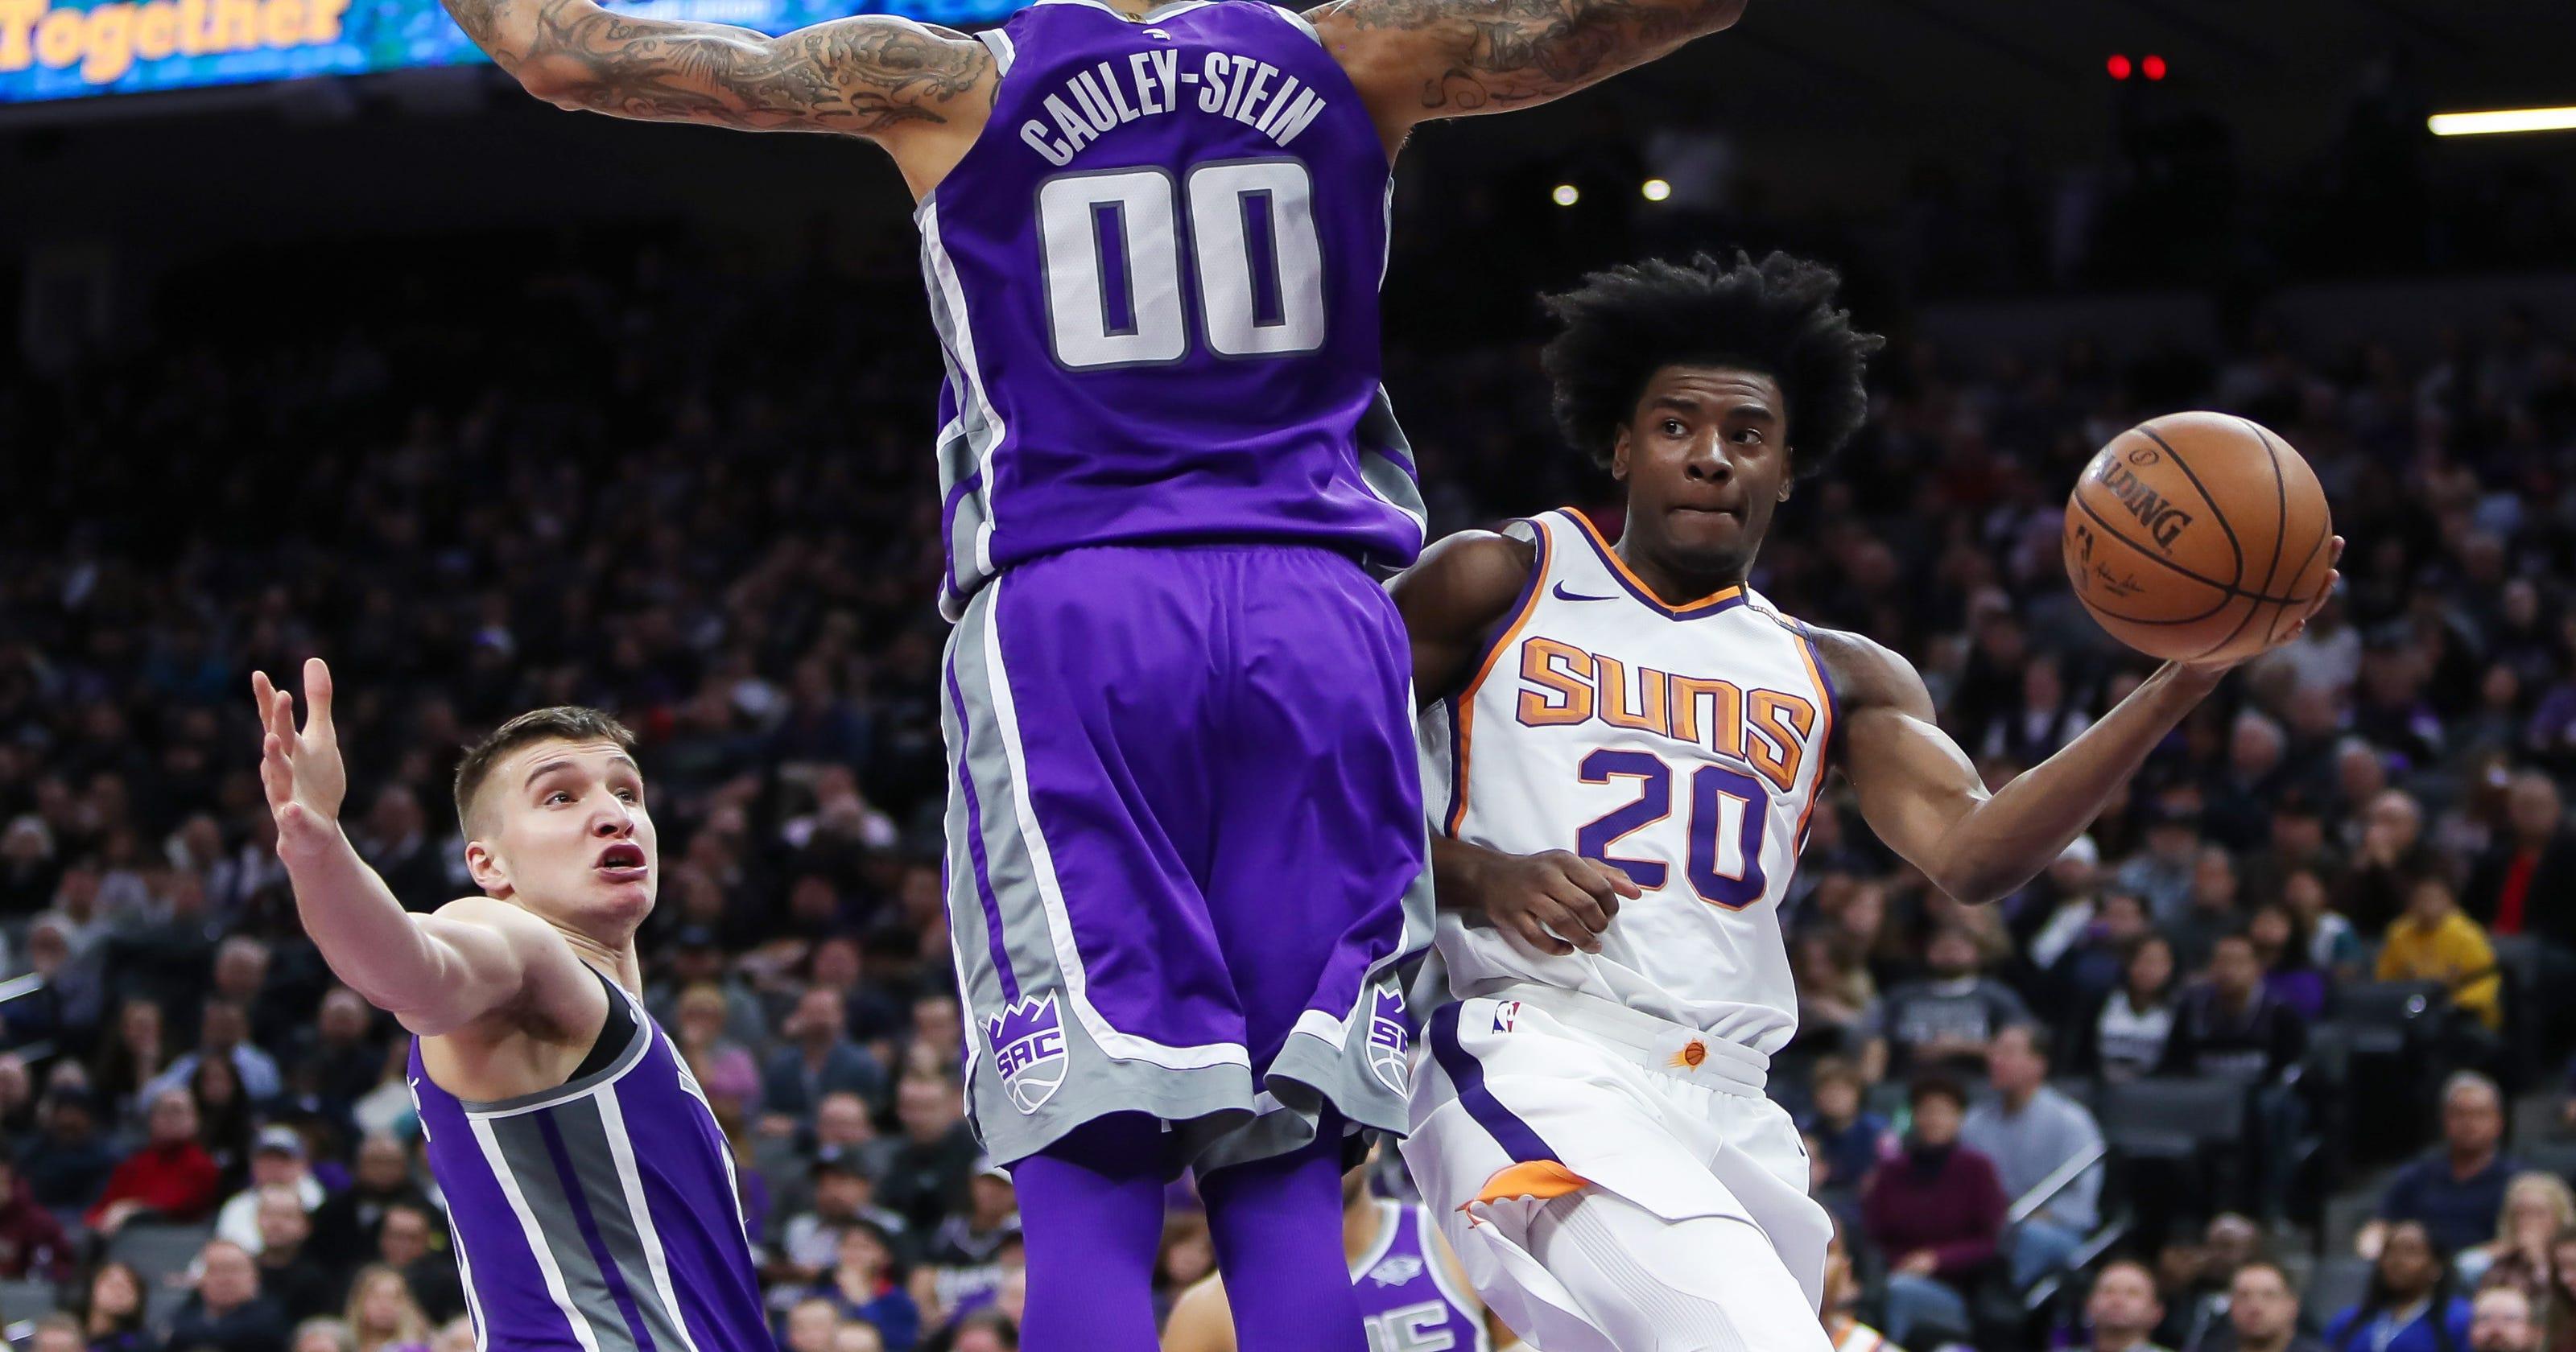 Suns News Josh Jacksons Offensive Struggles Led To Benching